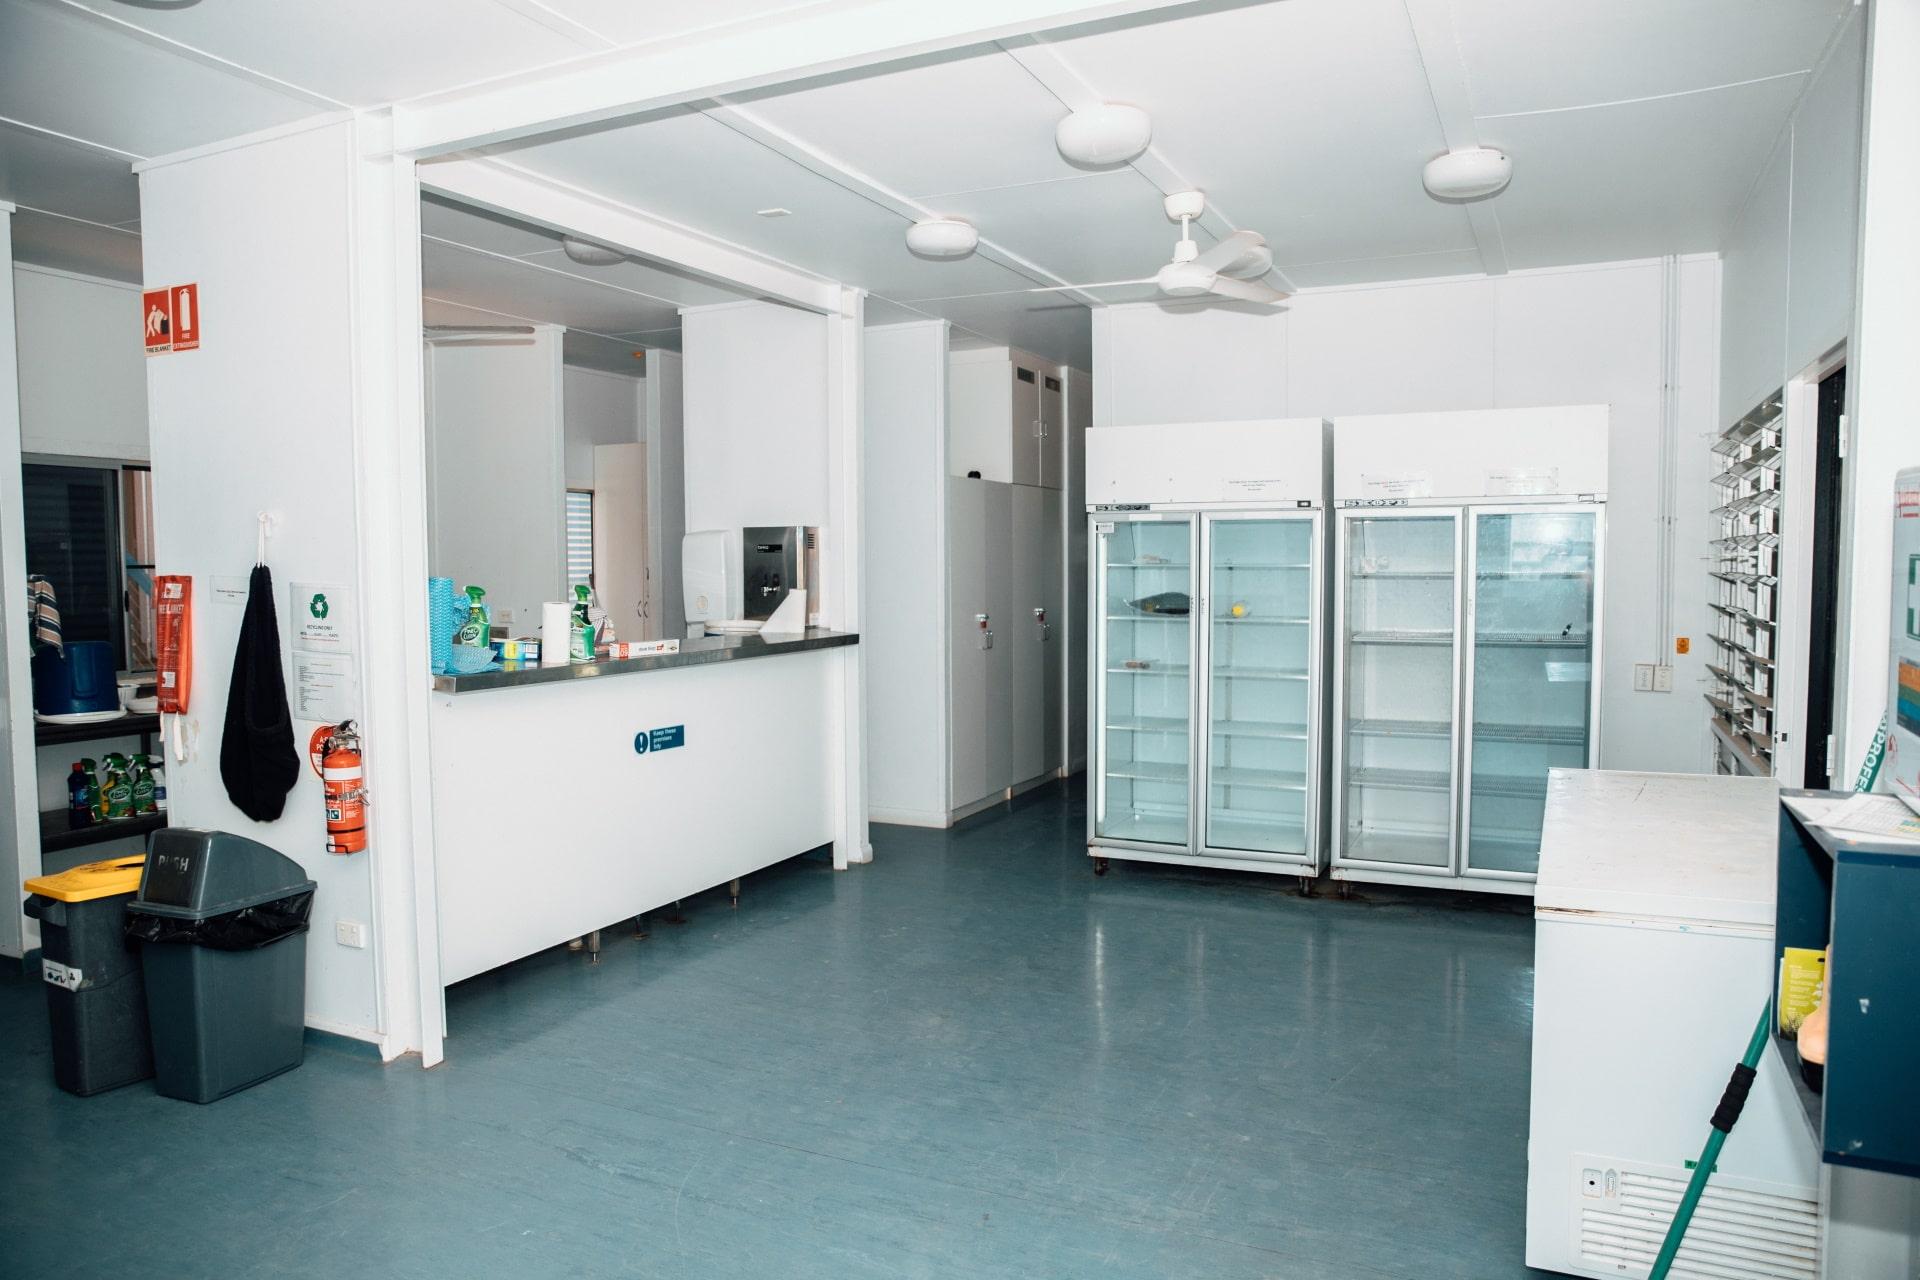 Communal fridges.